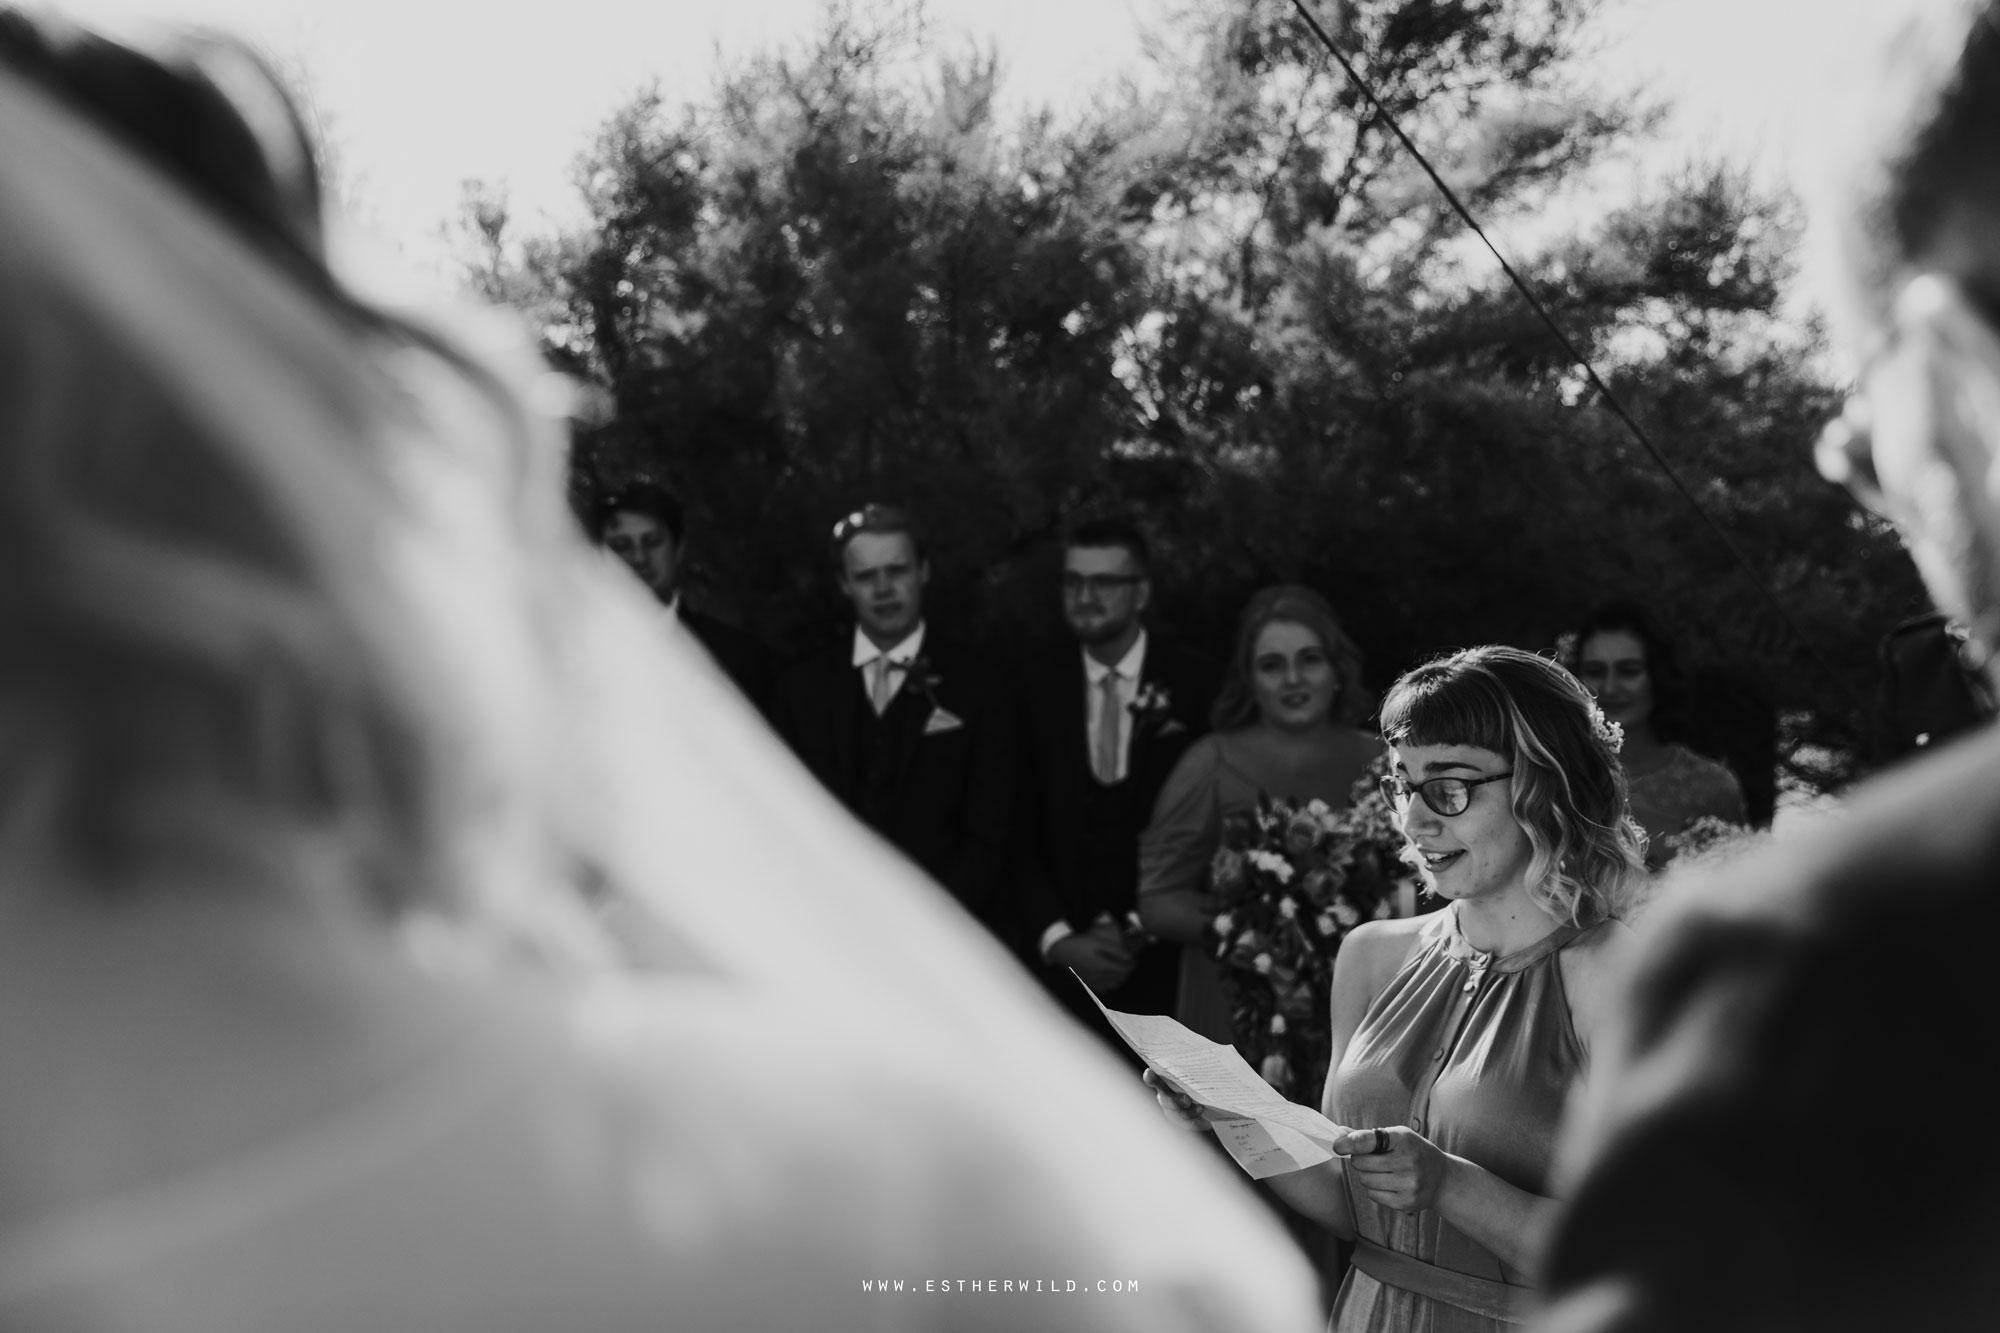 Cromer_Wedding_Beach_Outdoor_Ceremony_Norfolk_North_Lodge_Registry_Office_Rocket_House_Cafe_Cromer_Pier_IMG_3860.jpg